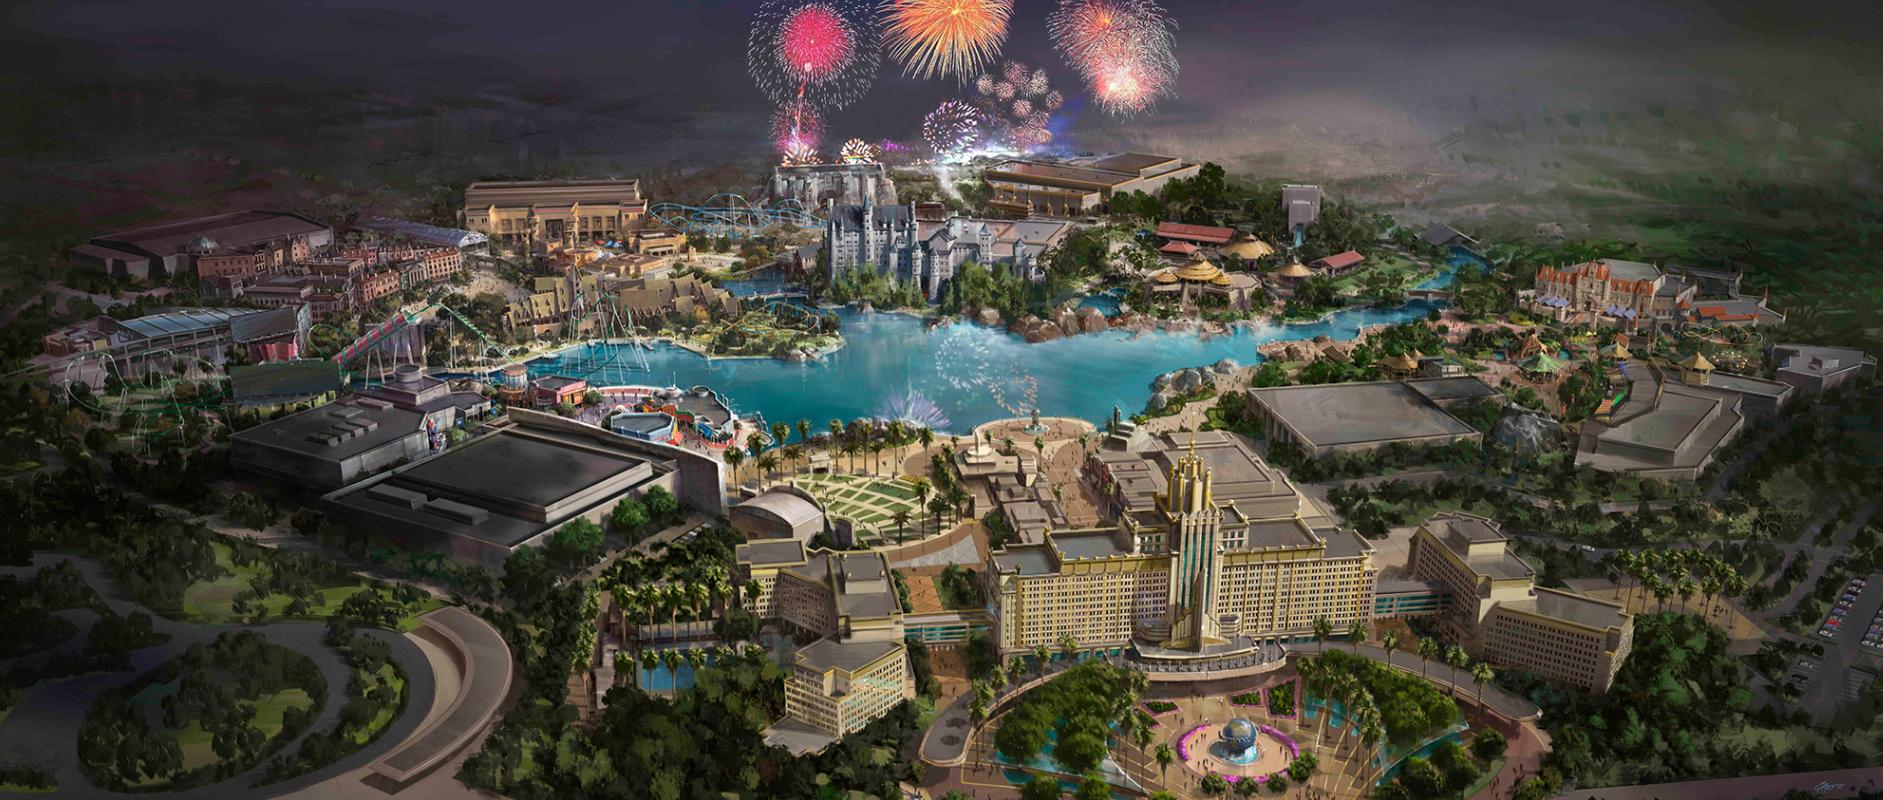 universal studios beijing park and resort - CityWalk, un nuevo arte conceptual 2